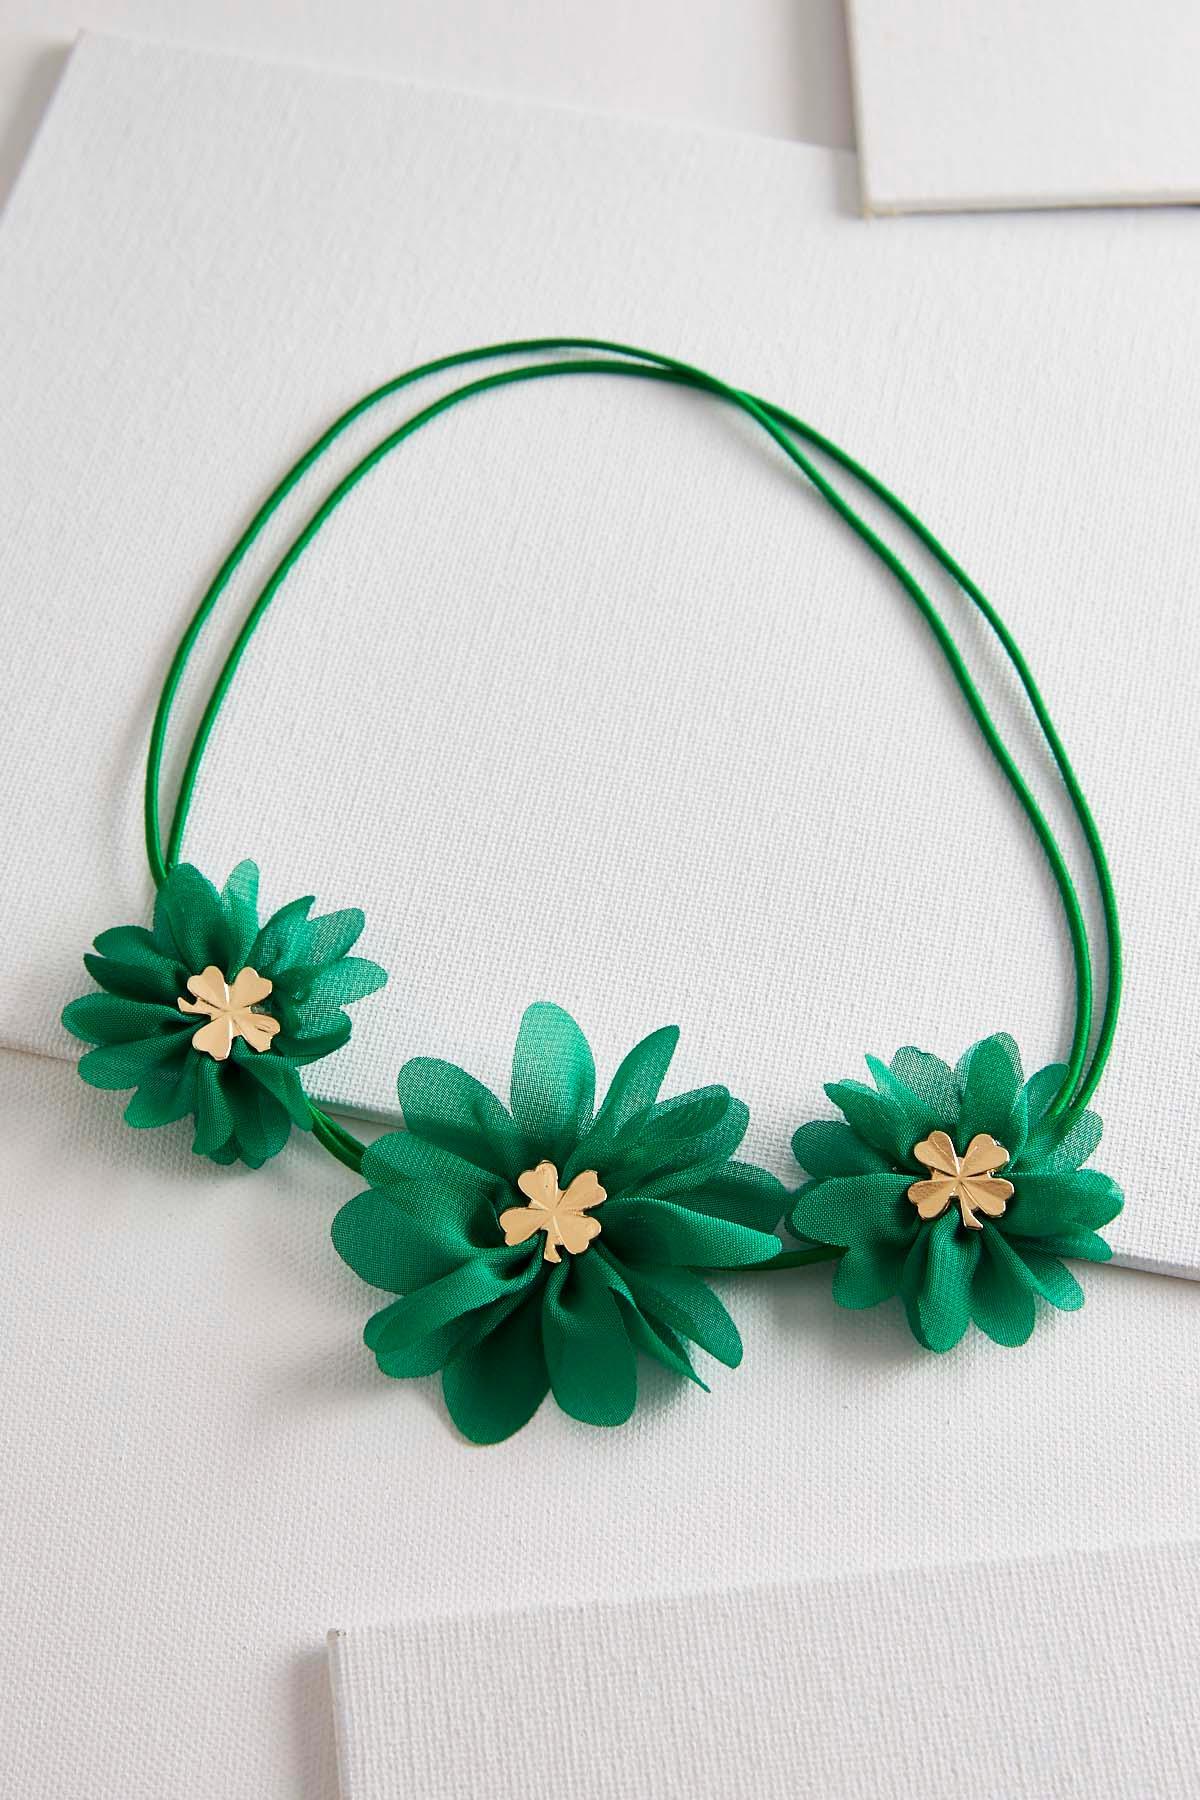 floral clover elastic headband s